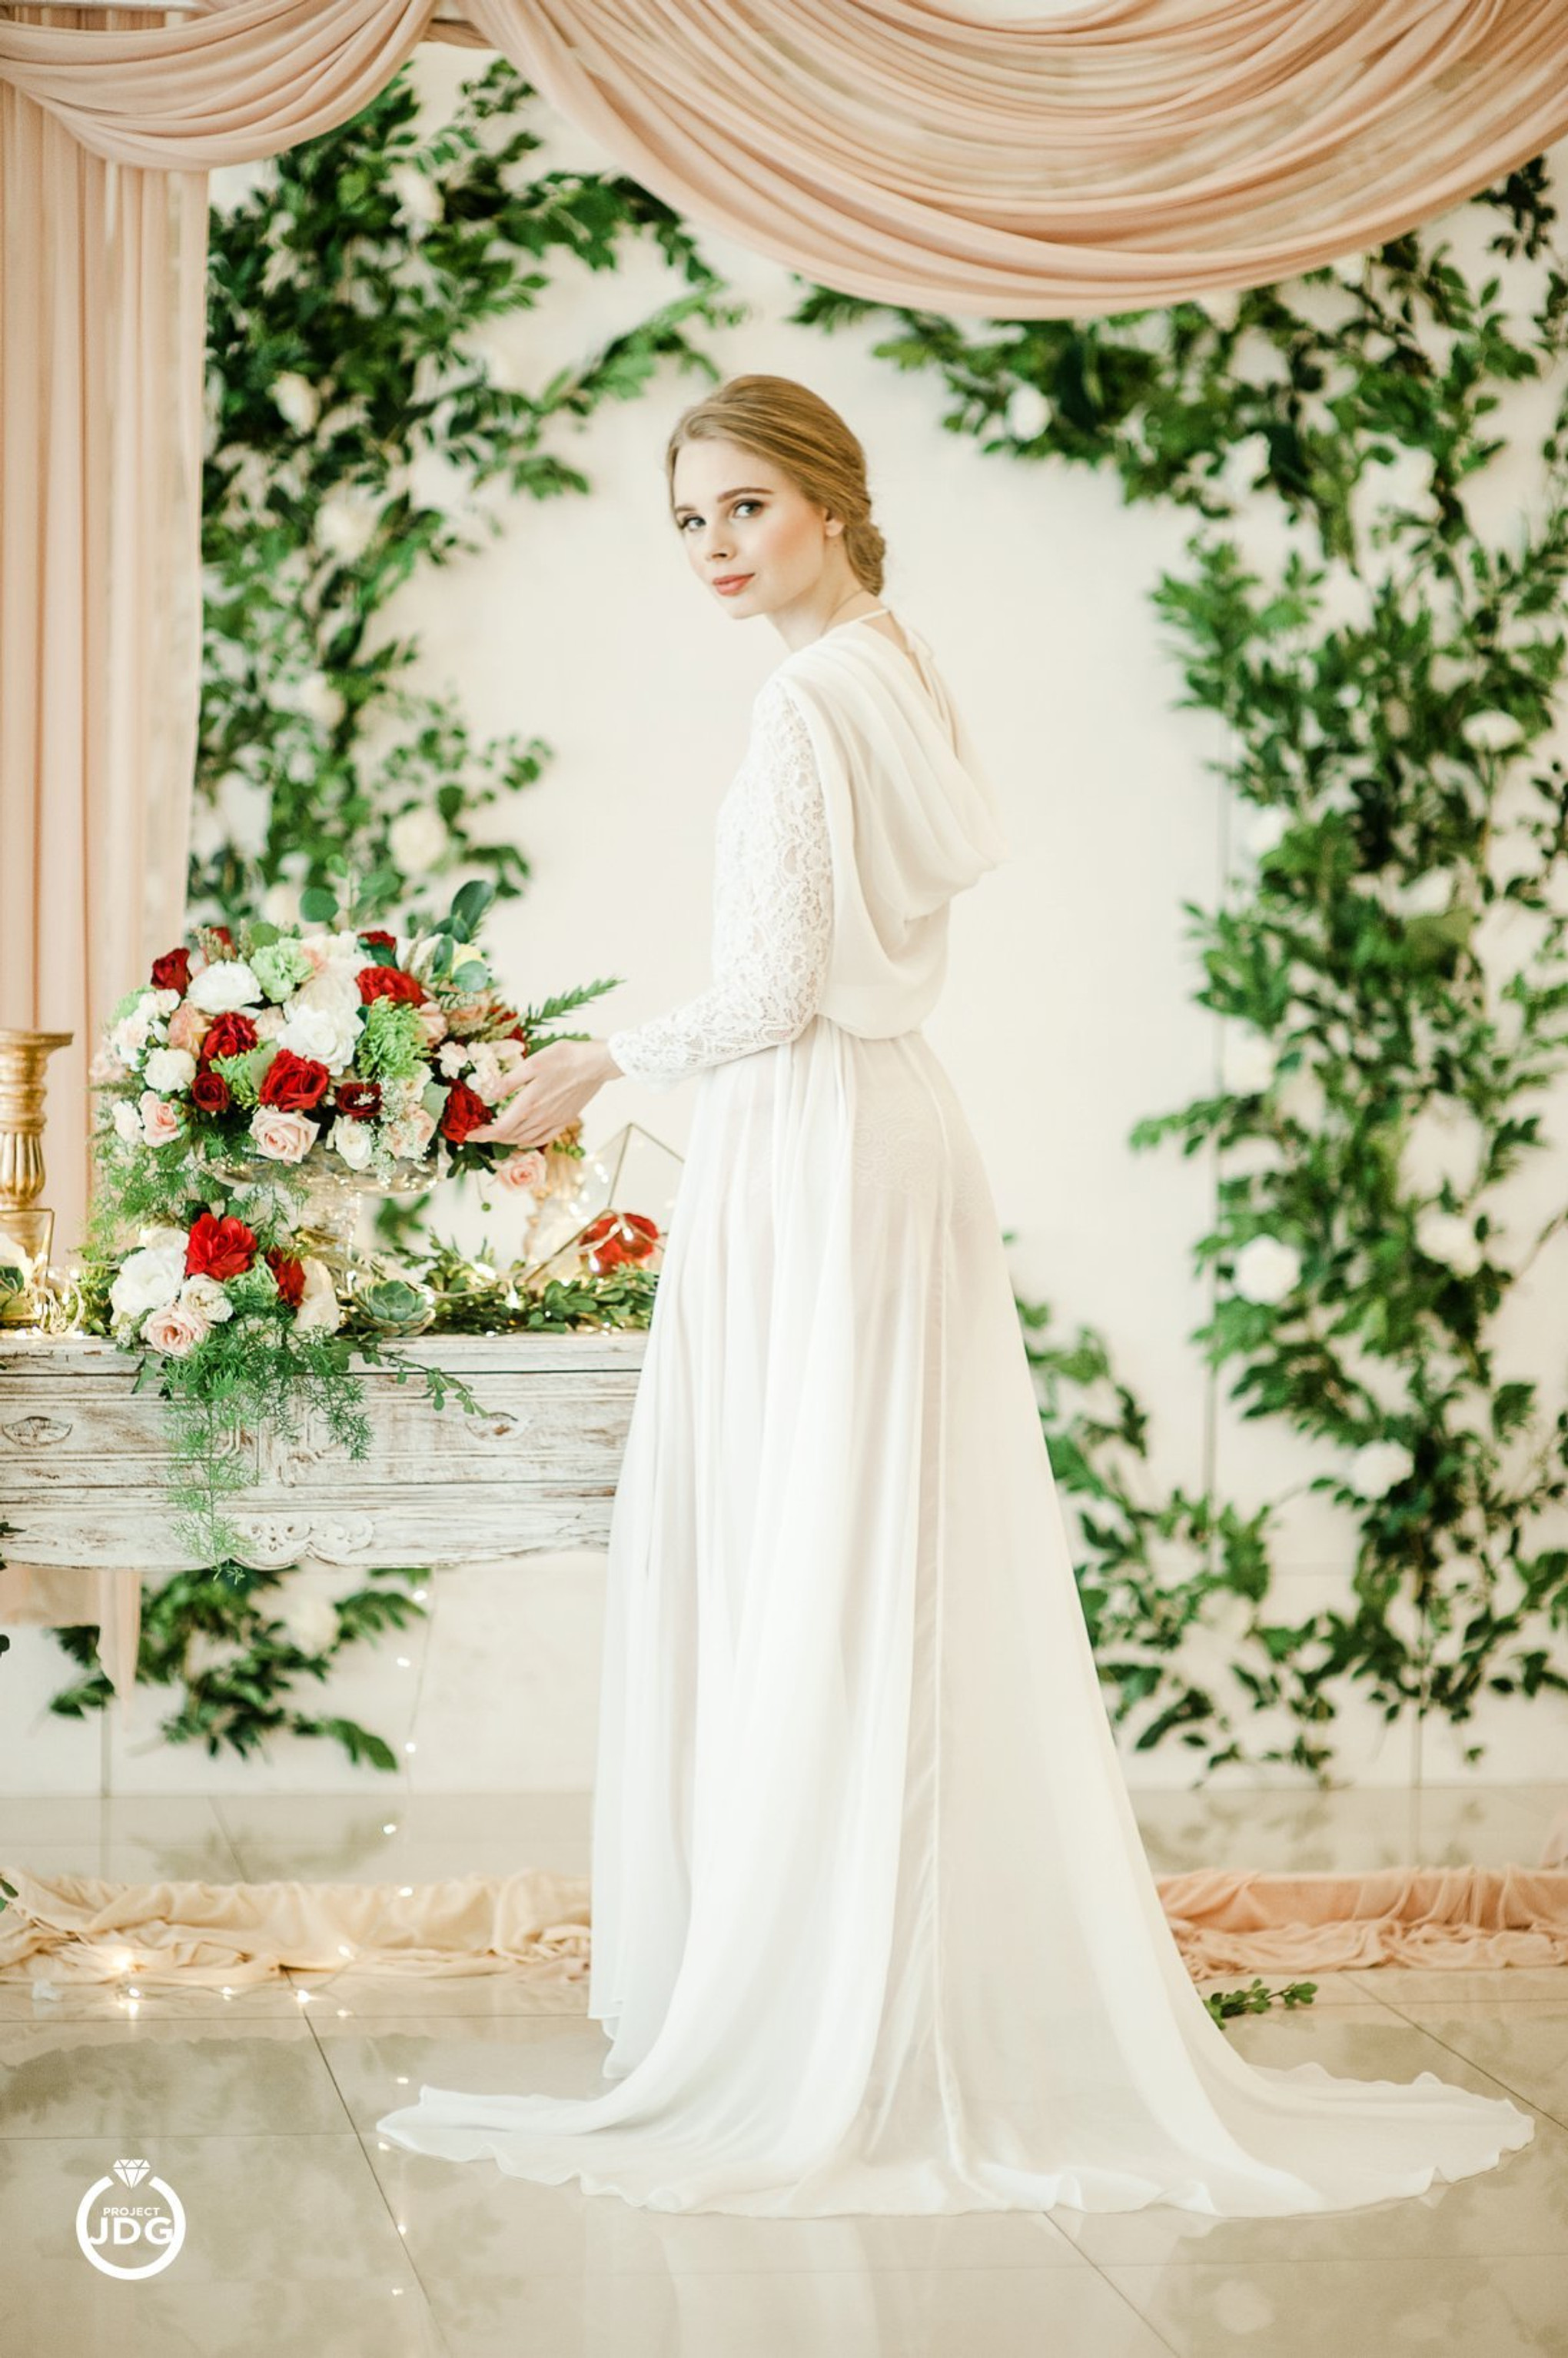 A Dreamy Bridal Boudoir Session Inspiration - Bridestory Blog